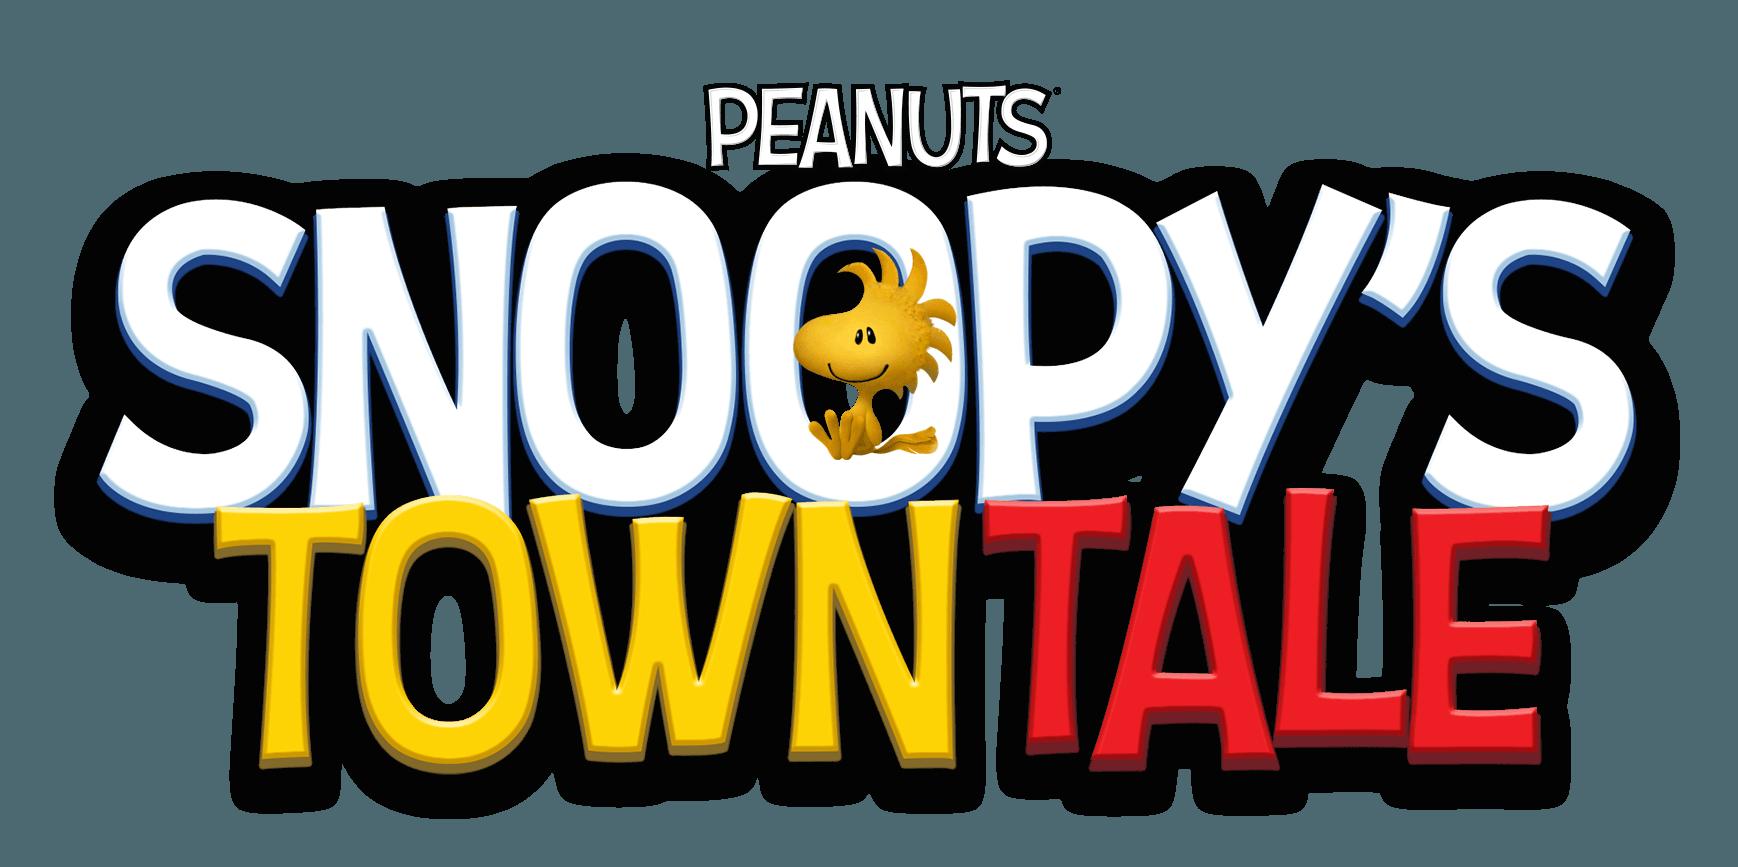 peanuts snoopy s town tale